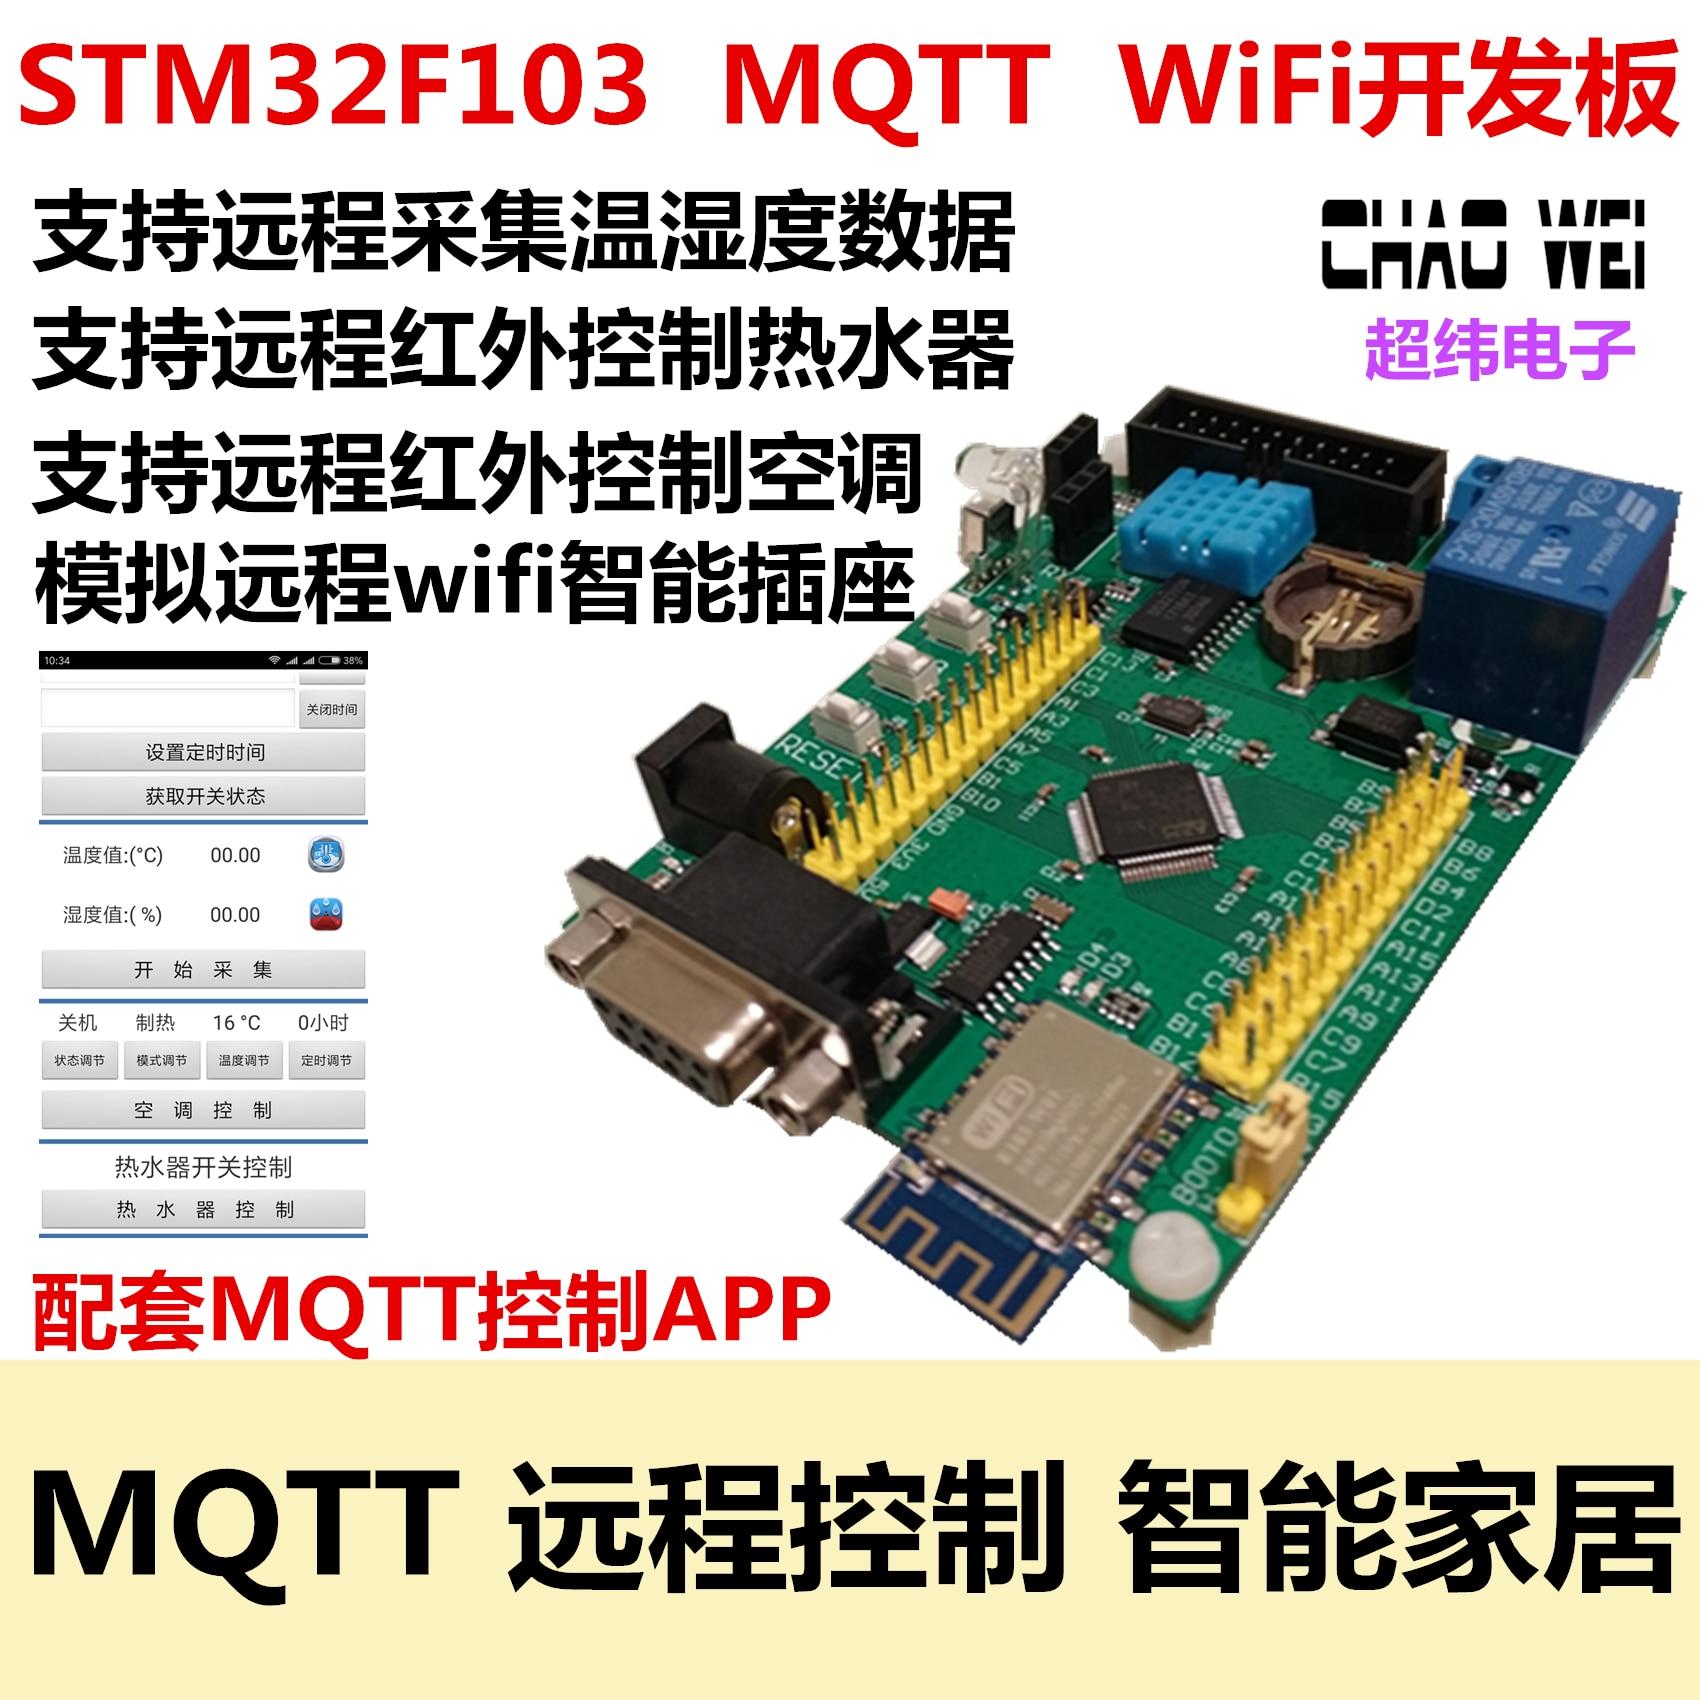 цена на Internet of things MQTT remote control air conditioner water heater STM32F103 WiFi esp8266 development board